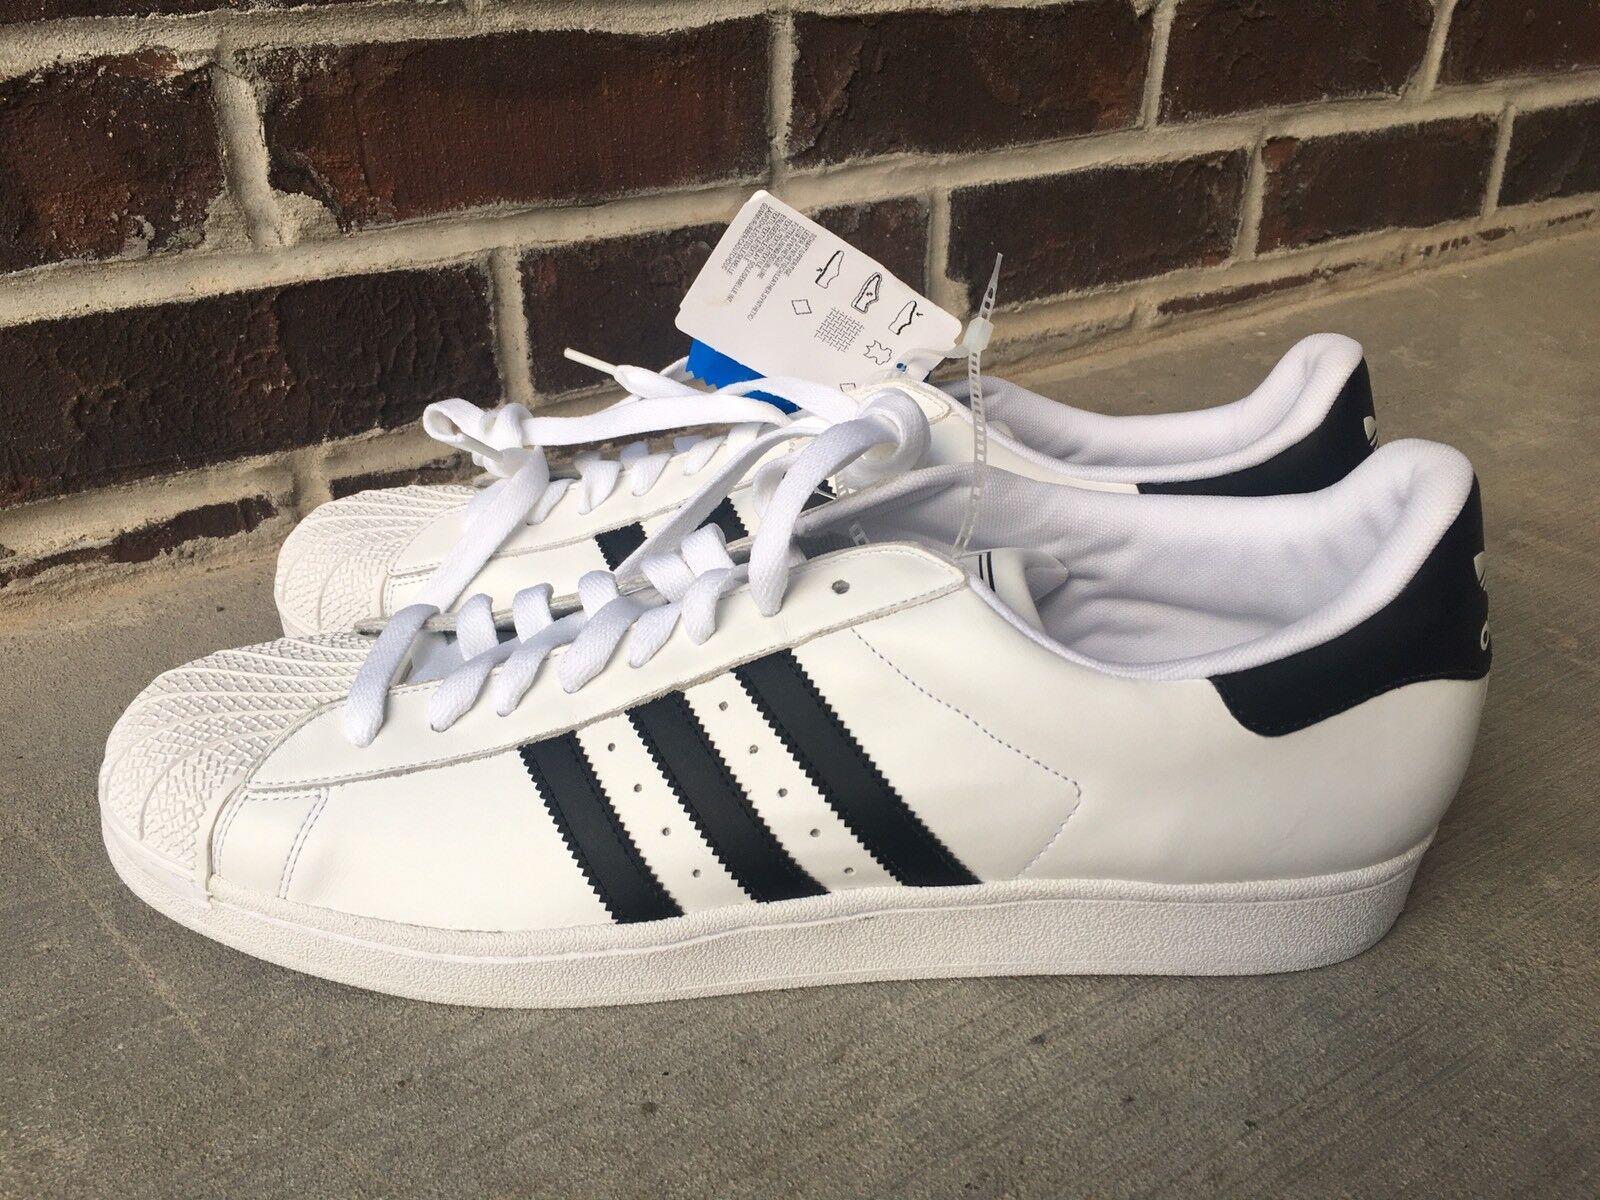 Nuove adidas originali superstar 2 uomo bianco retrscarpe shell dei 19